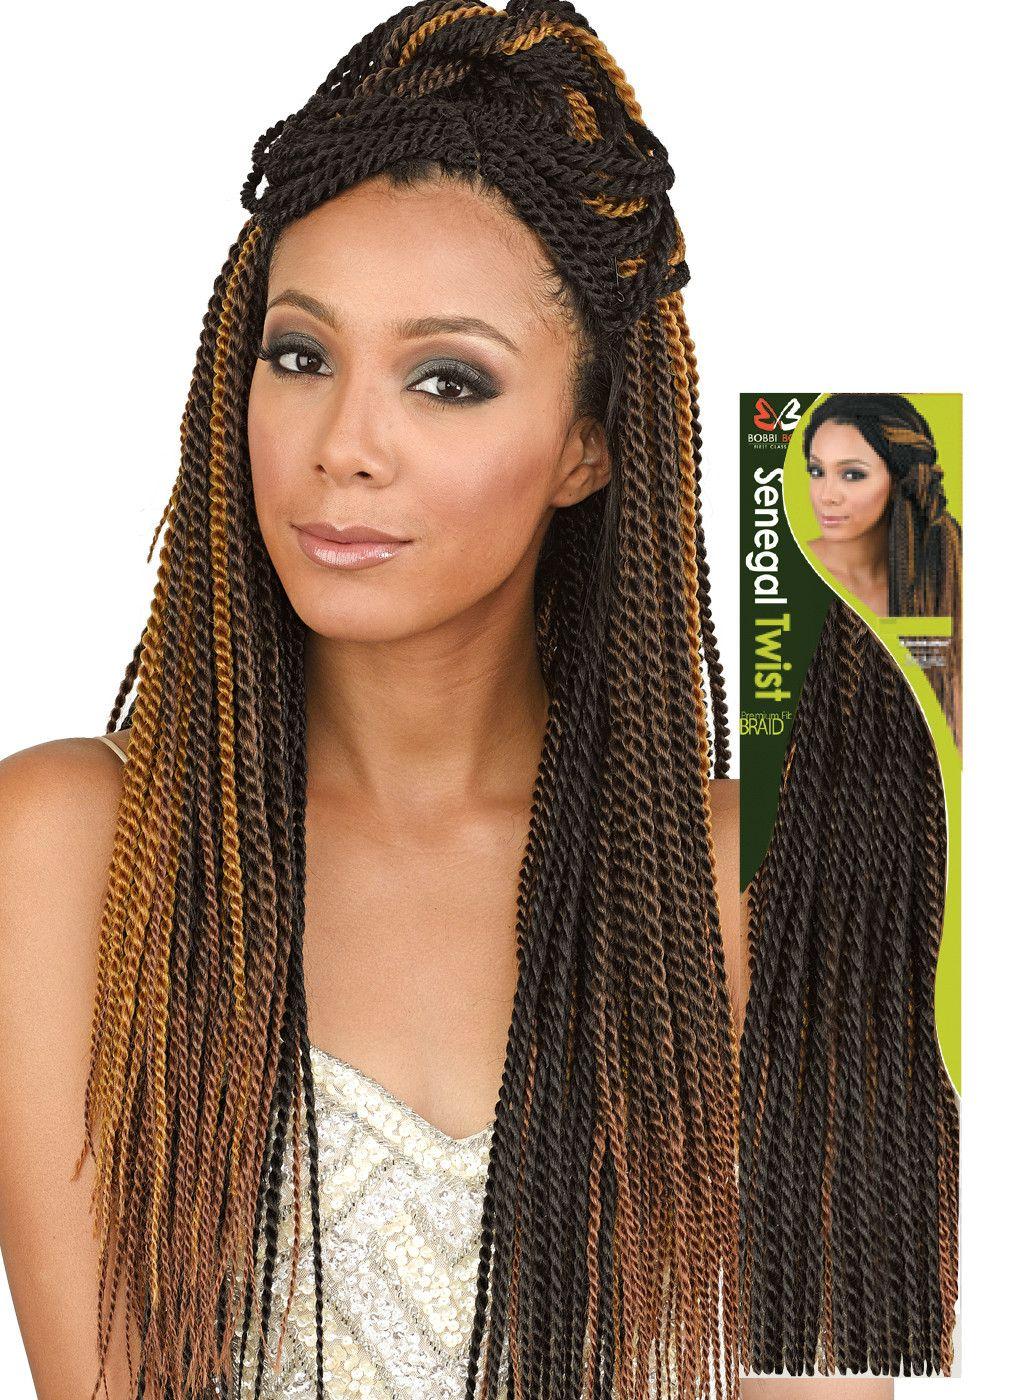 Bobbi Boss Senegal Twist Crochet Braid Twist Braid Hairstyles